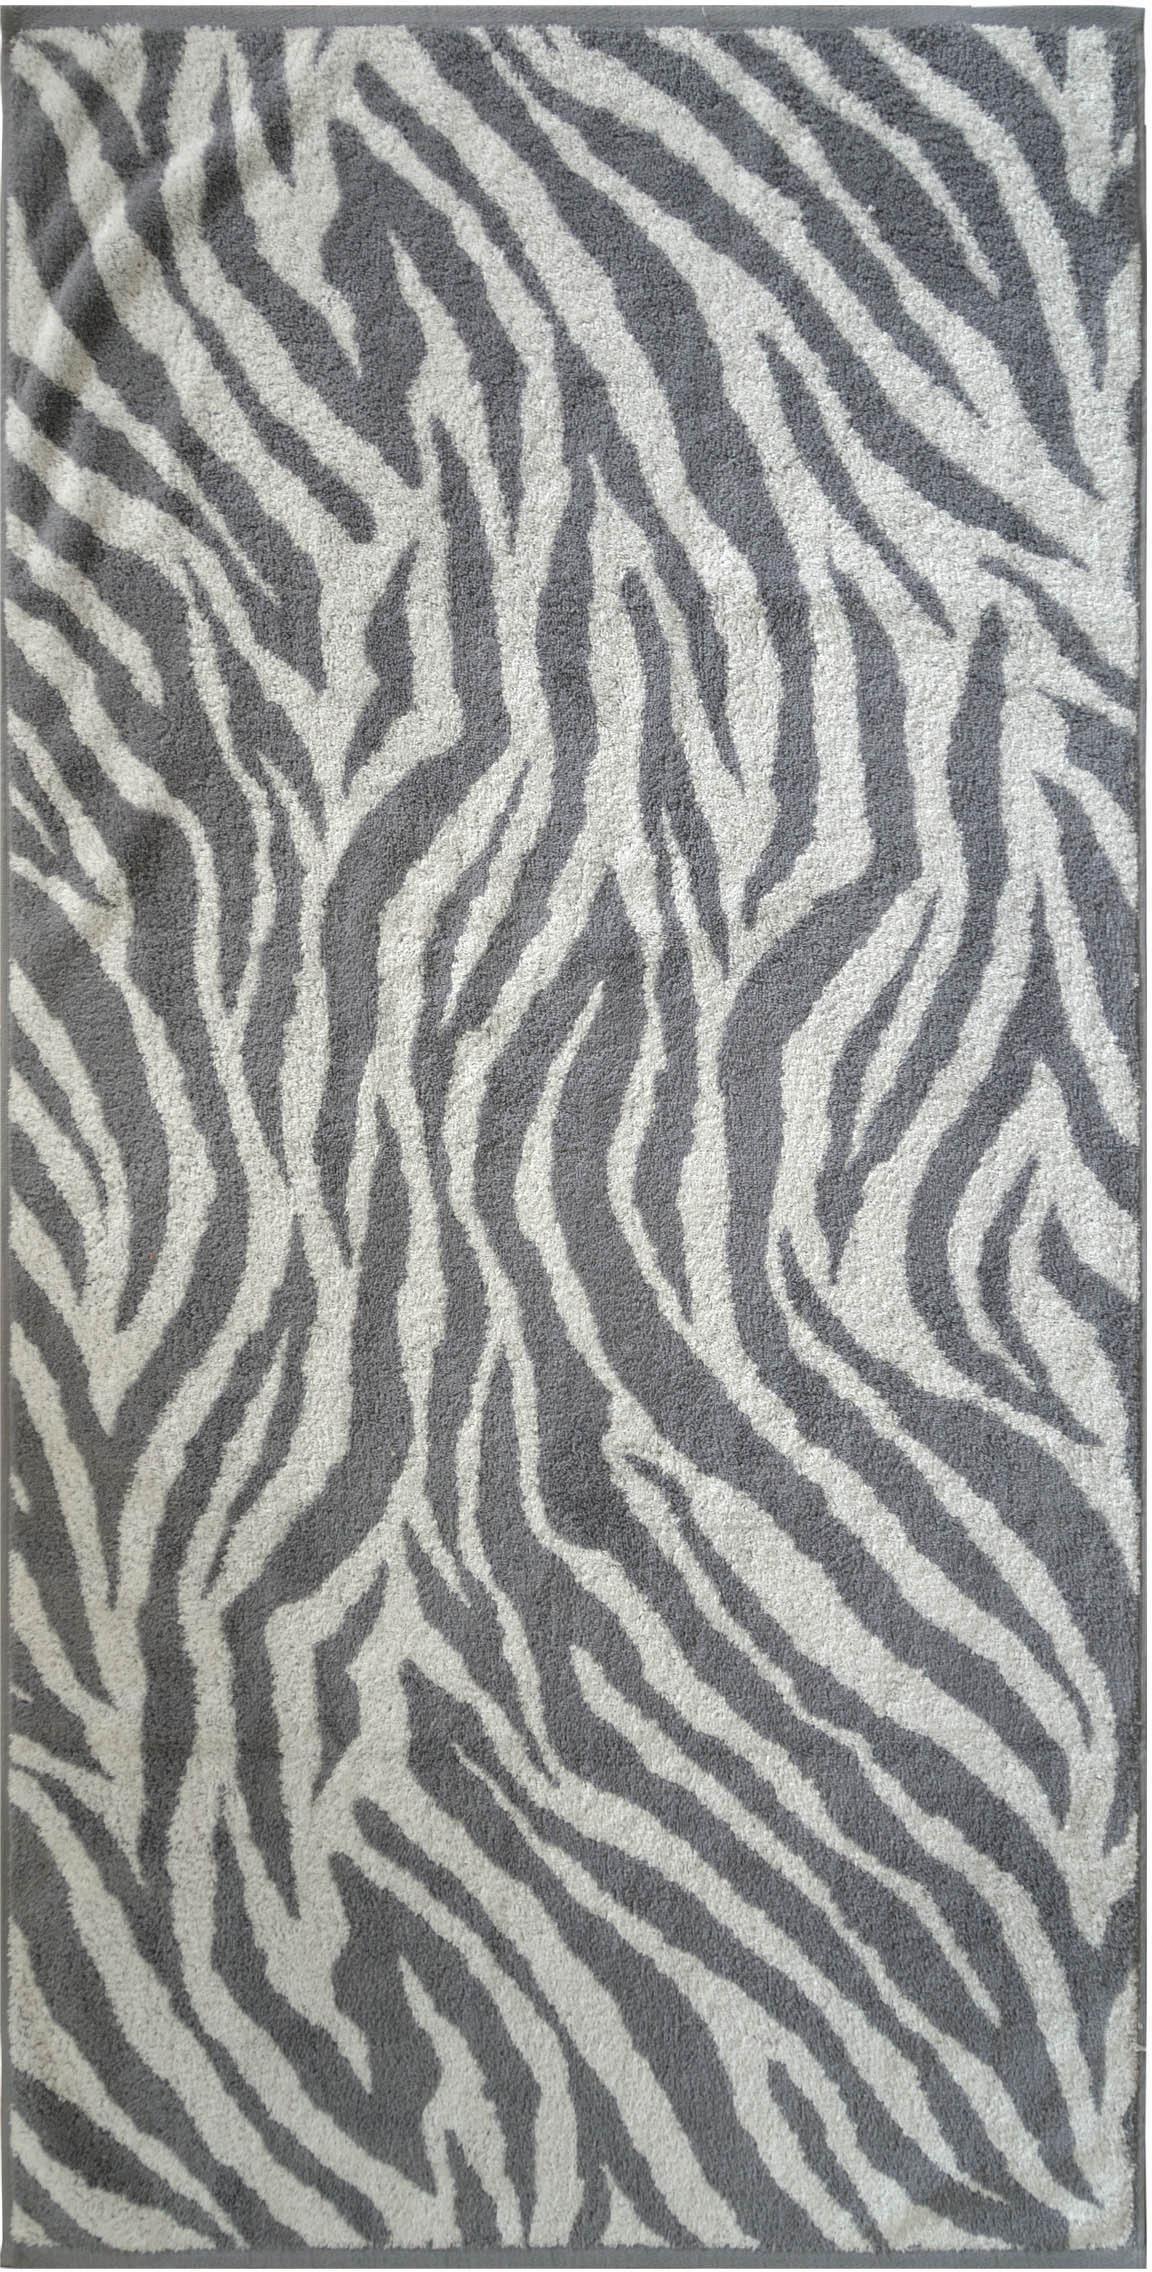 Badetuch, Dyckhoff, »Zebra«, in Zebrastreifen-Optik | Bad > Handtücher > Badetücher | Dyckhoff